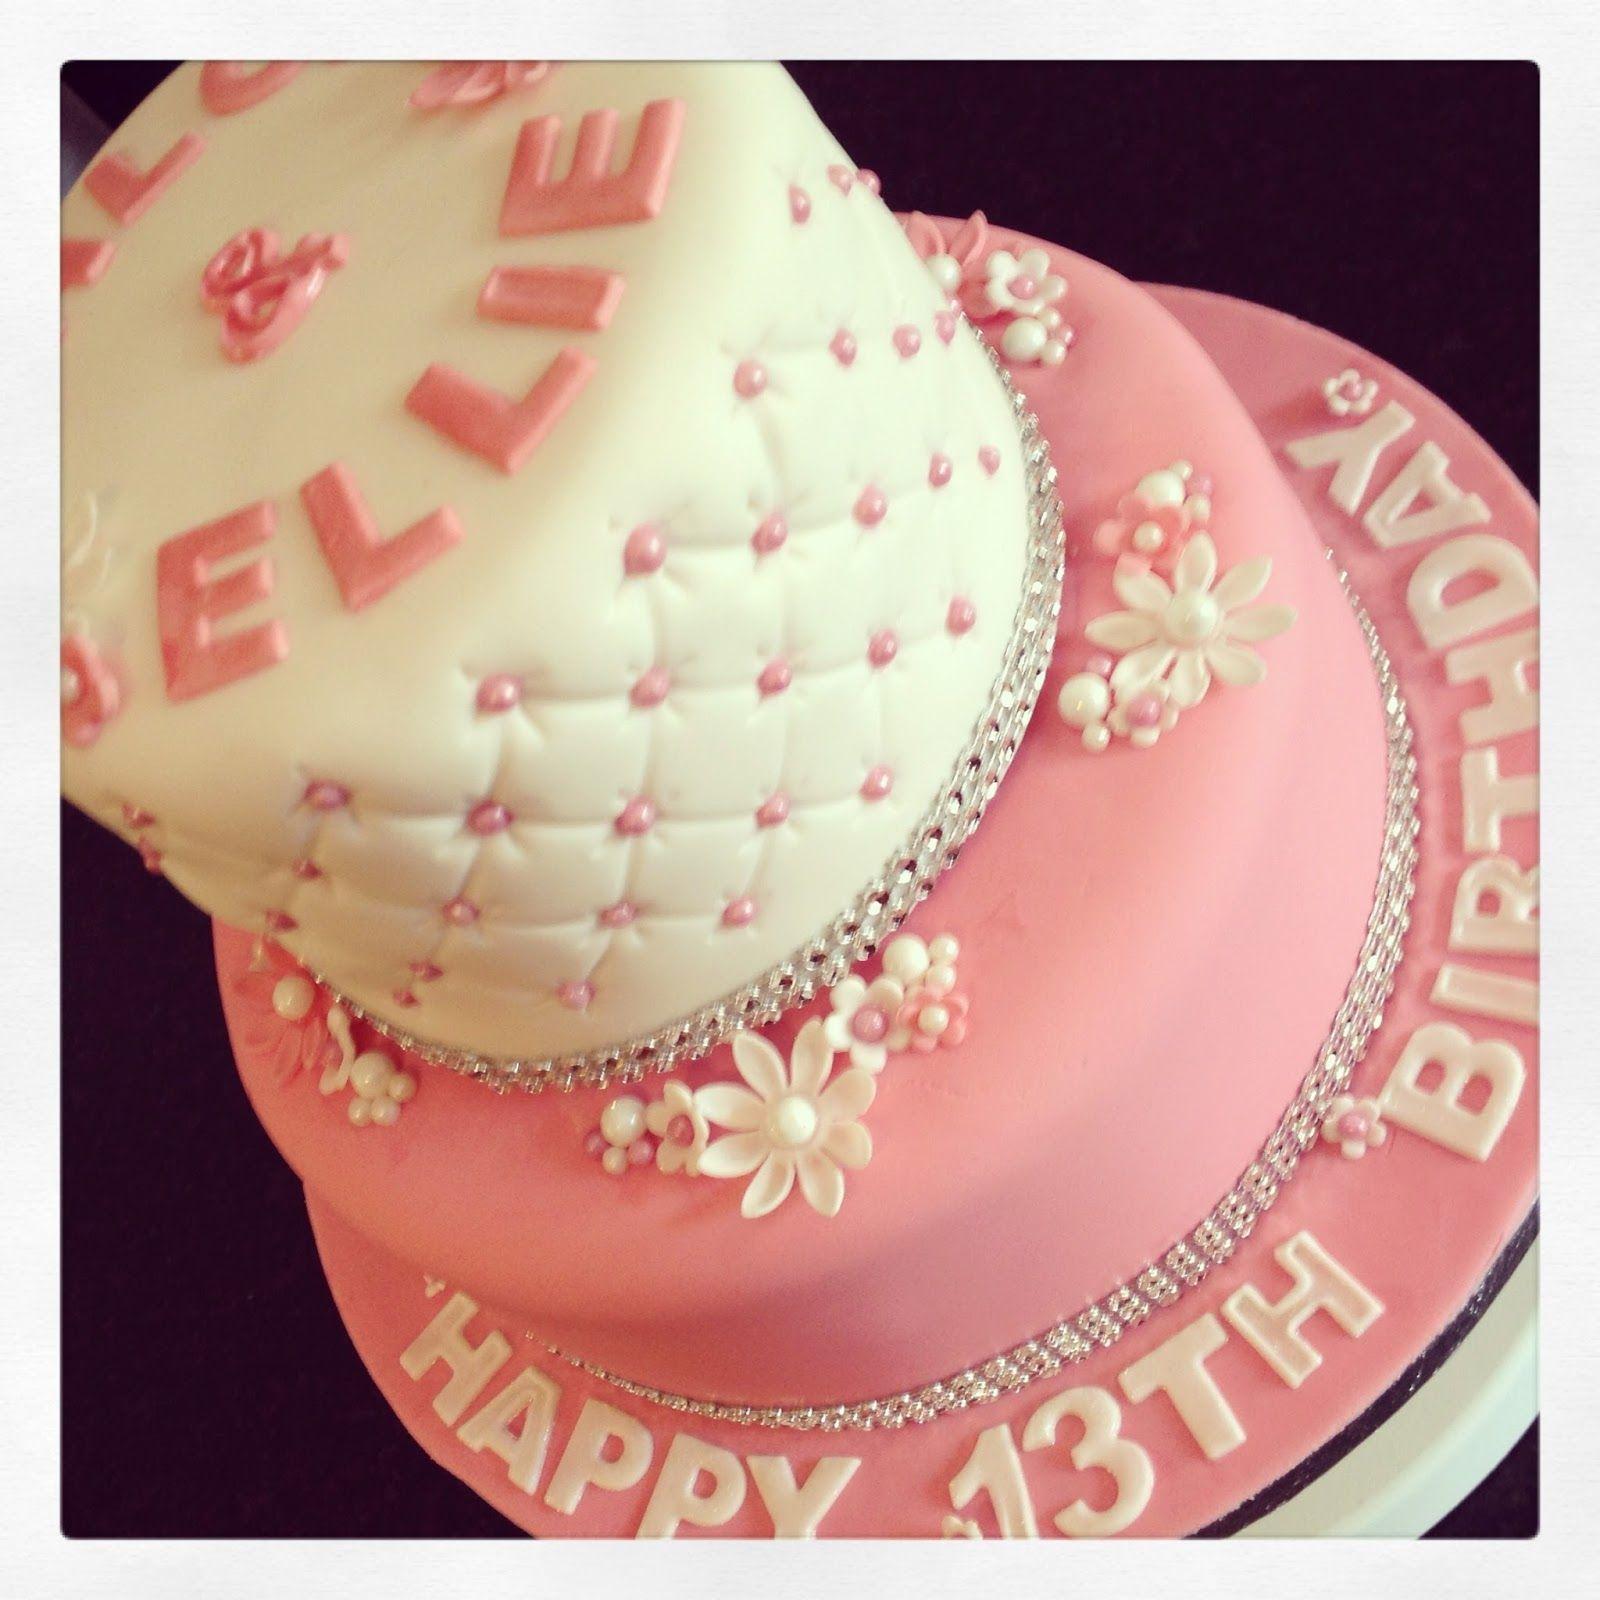 Enjoyable Pin On Gege Birthday Cakes Funny Birthday Cards Online Inifofree Goldxyz